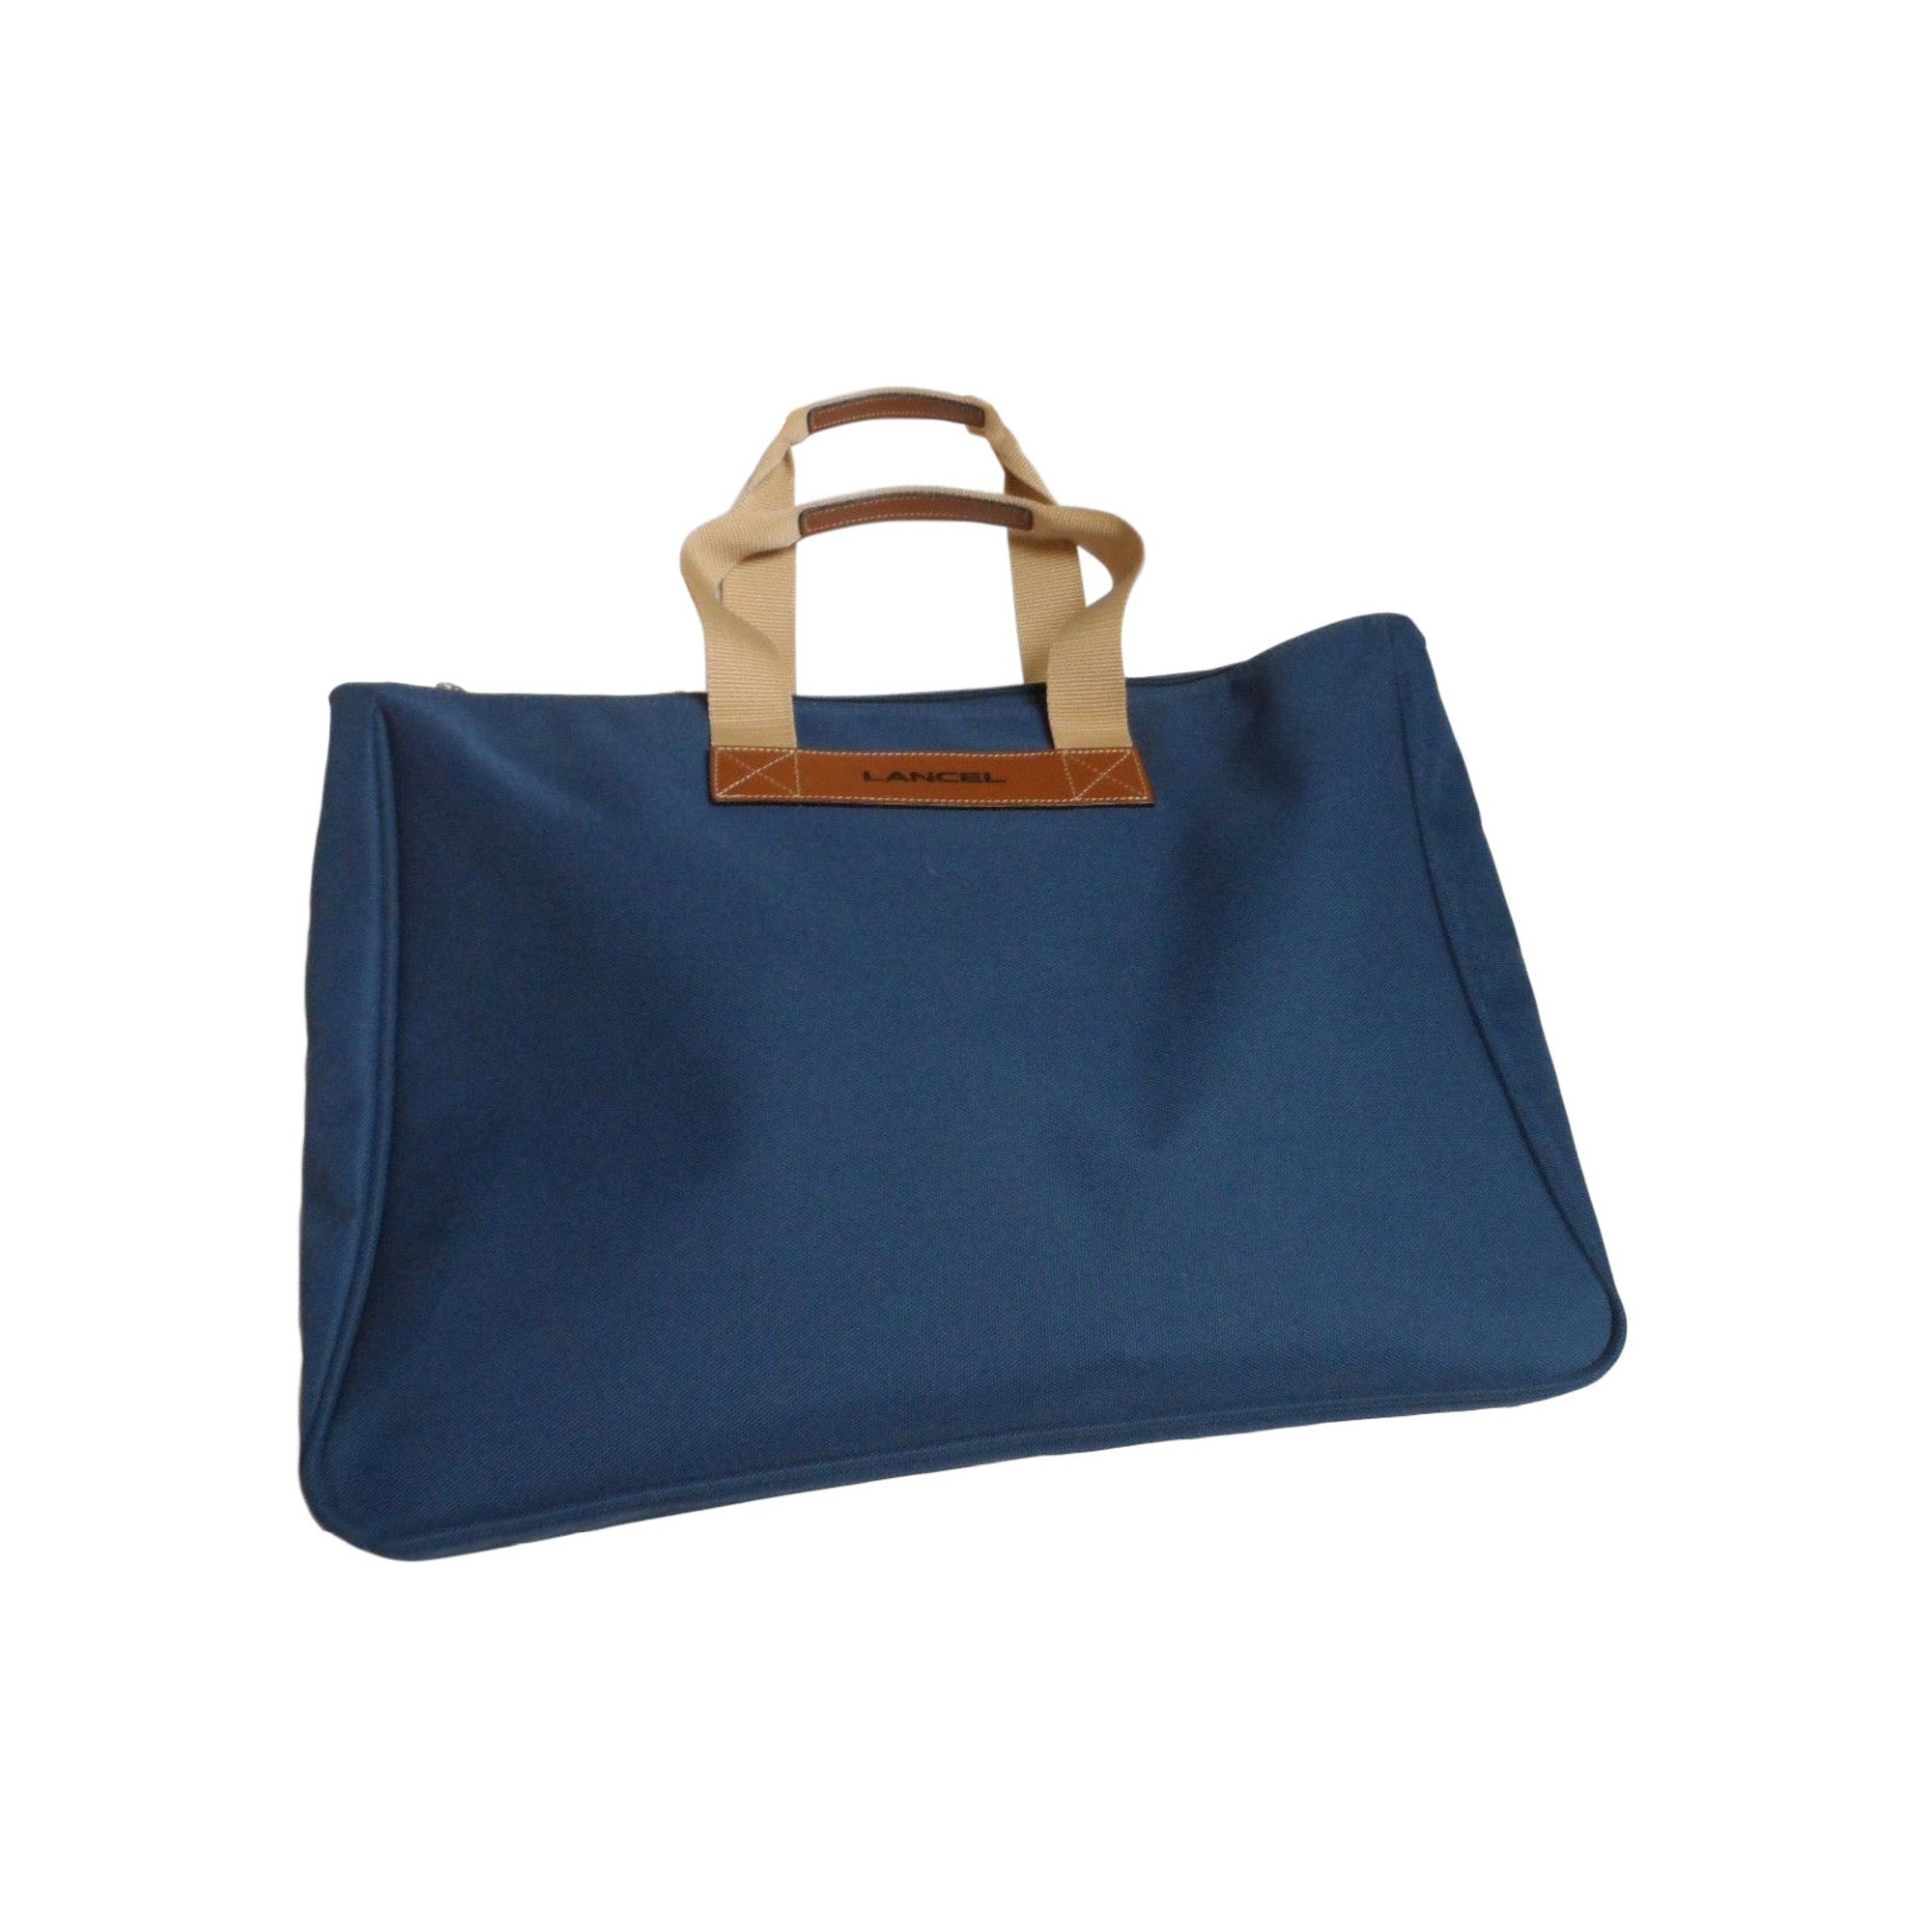 Non-Leather Oversize Bag LANCEL Blue, navy, turquoise